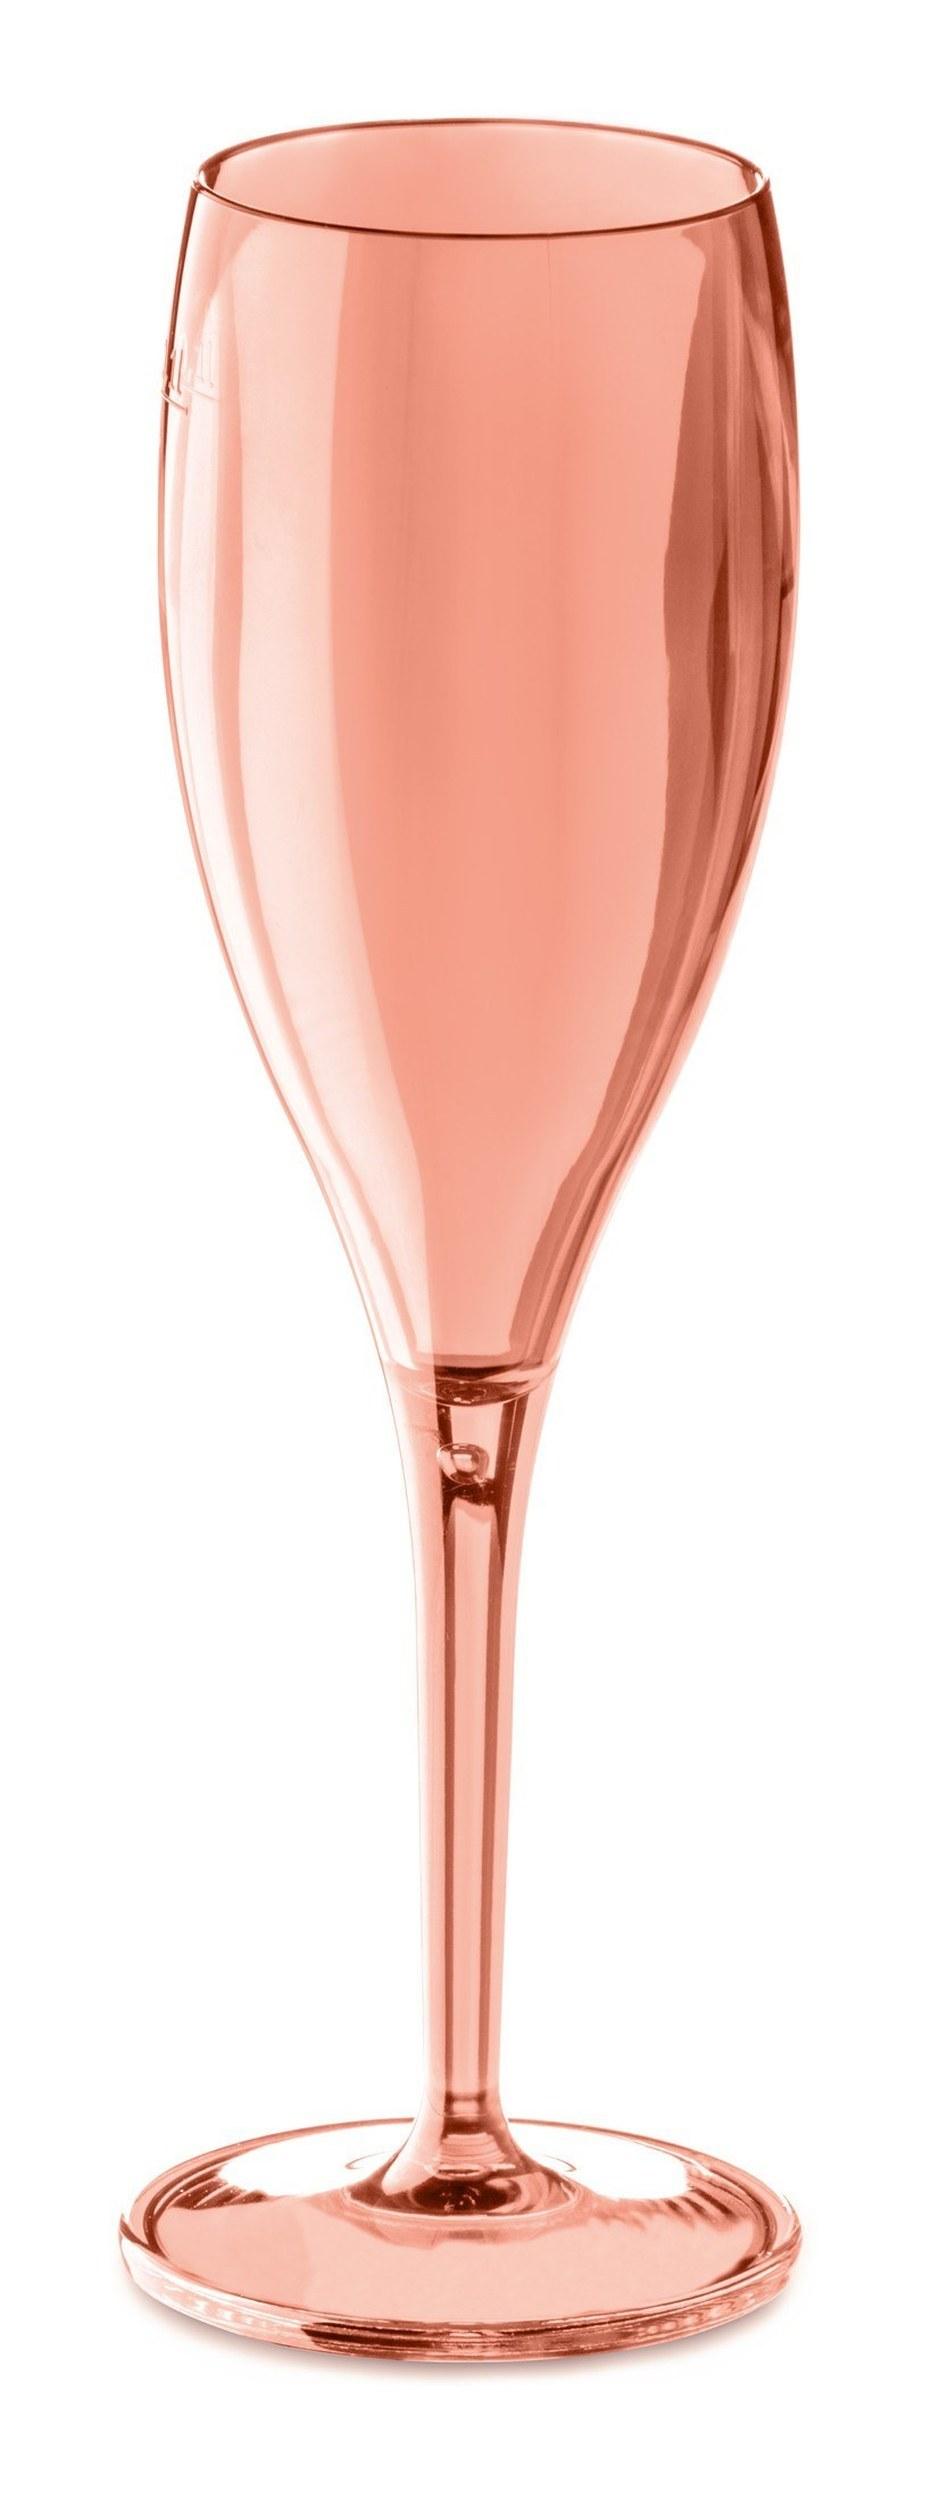 Kieliszki do szampana Cheers 4 szt. rose quartz